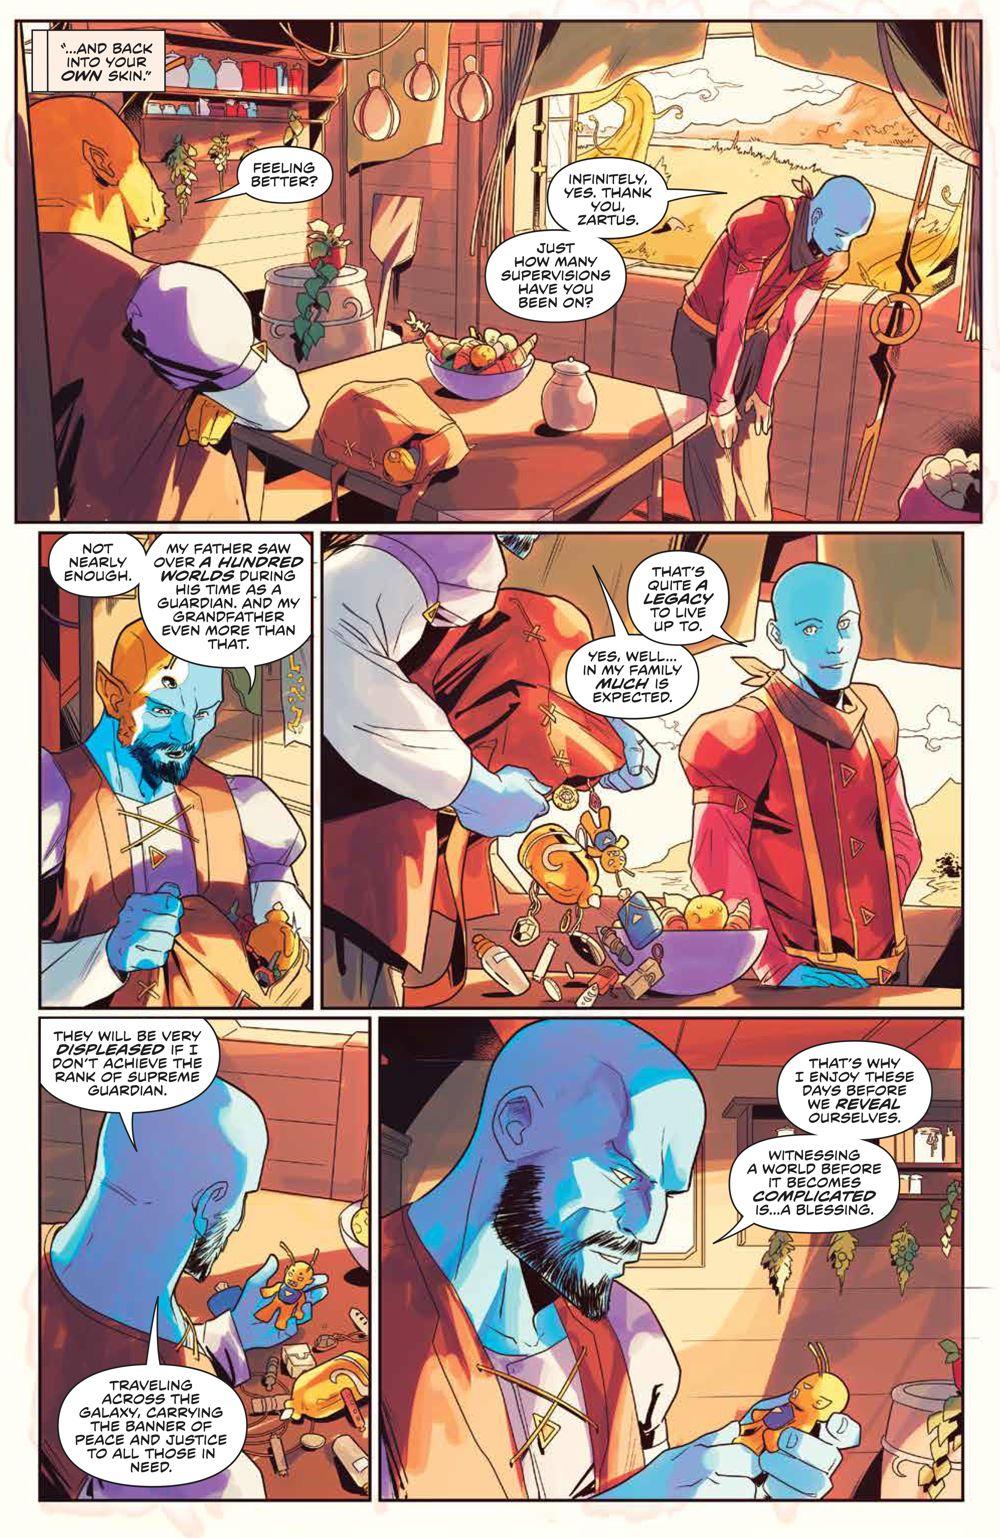 MightyMorphin_003_PRESS_4 ComicList Previews: MIGHTY MORPHIN #3